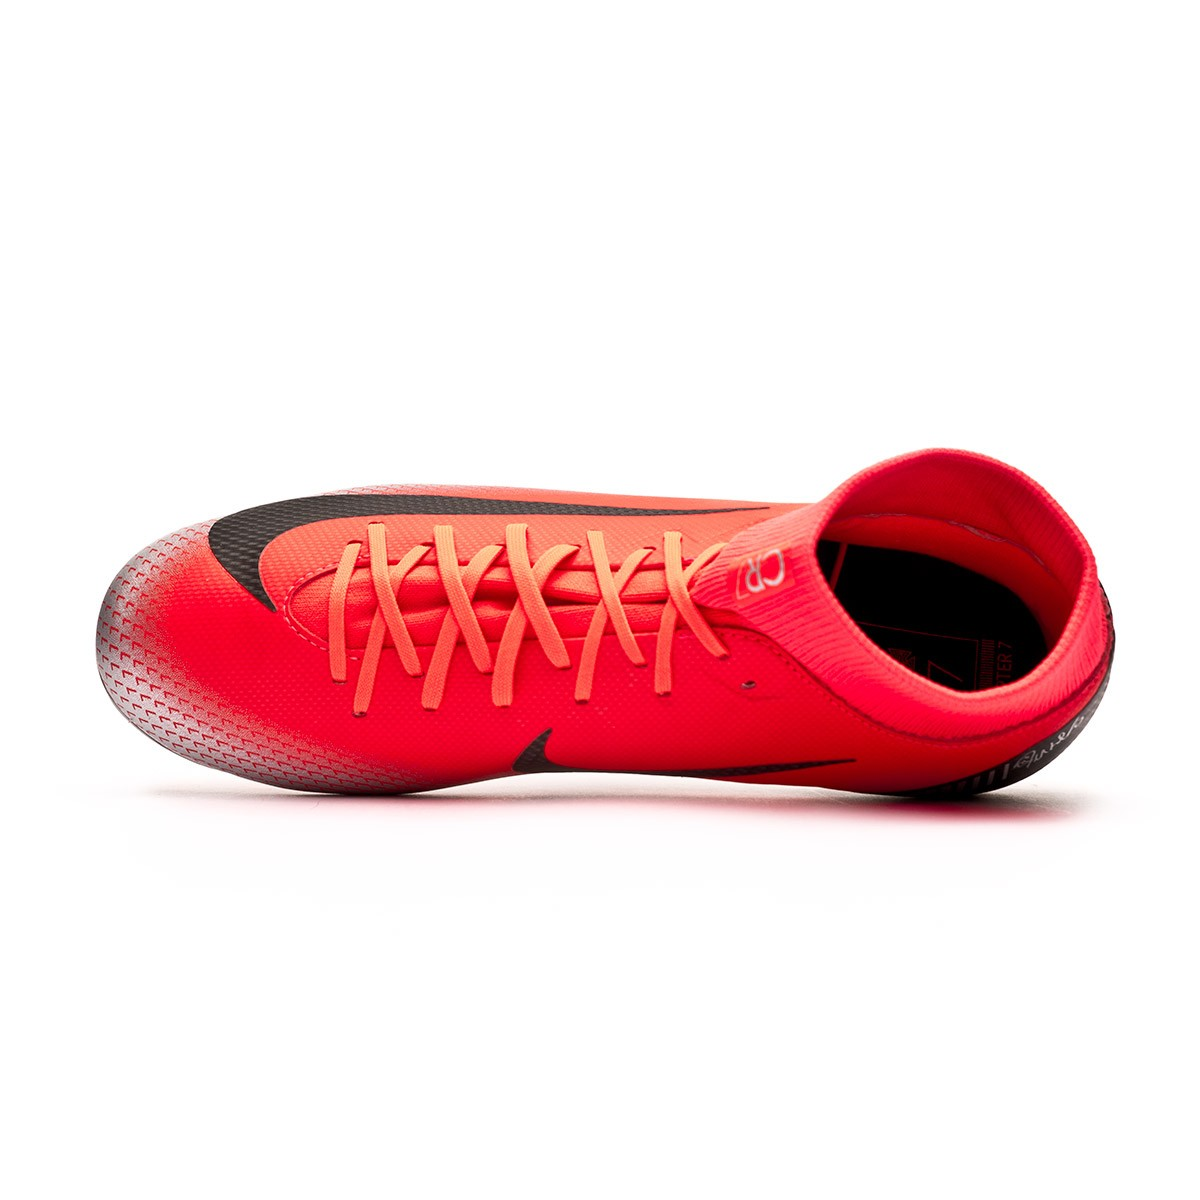 super cute 8dd6e 5c7d8 Scarpe Nike Mercurial Superfly VI Academy CR7 MG Bright crimson-Black -Chrome-Dark grey - Negozio di calcio Fútbol Emotion